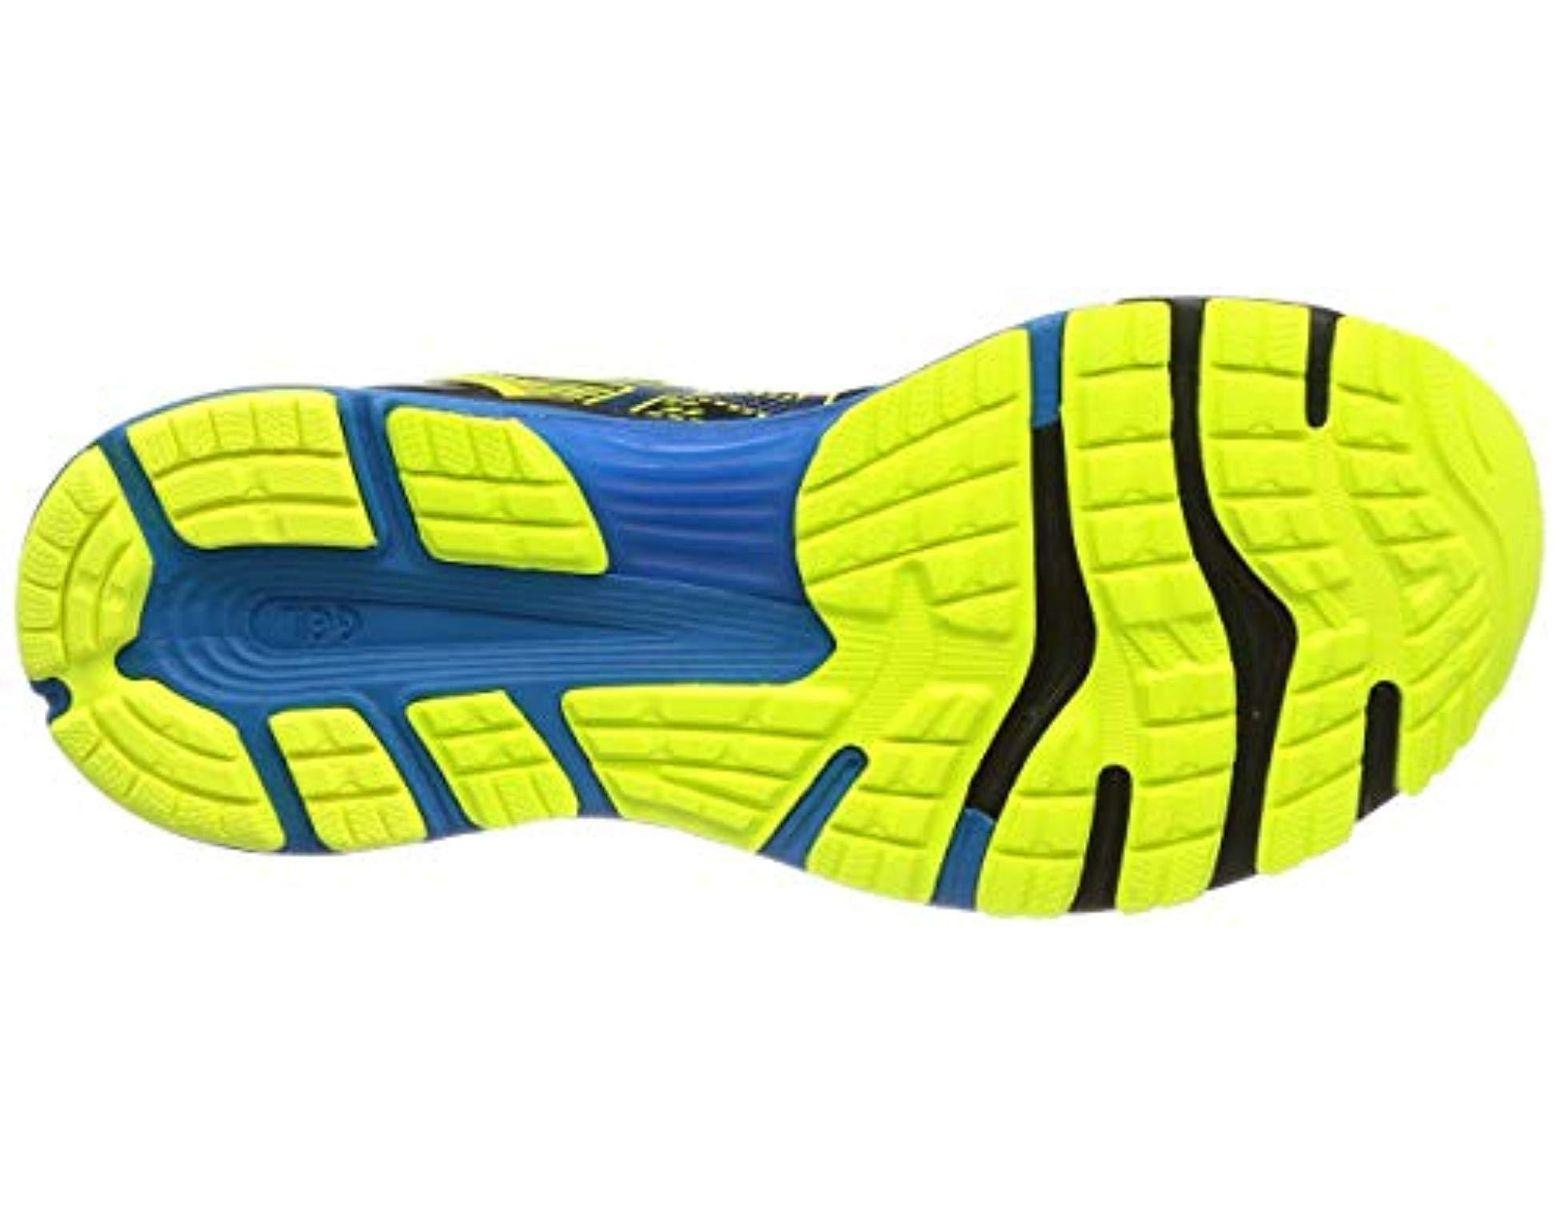 c471a330c Asics Gel-nimbus 21 Sp Running Shoes in Black for Men - Save 29% - Lyst